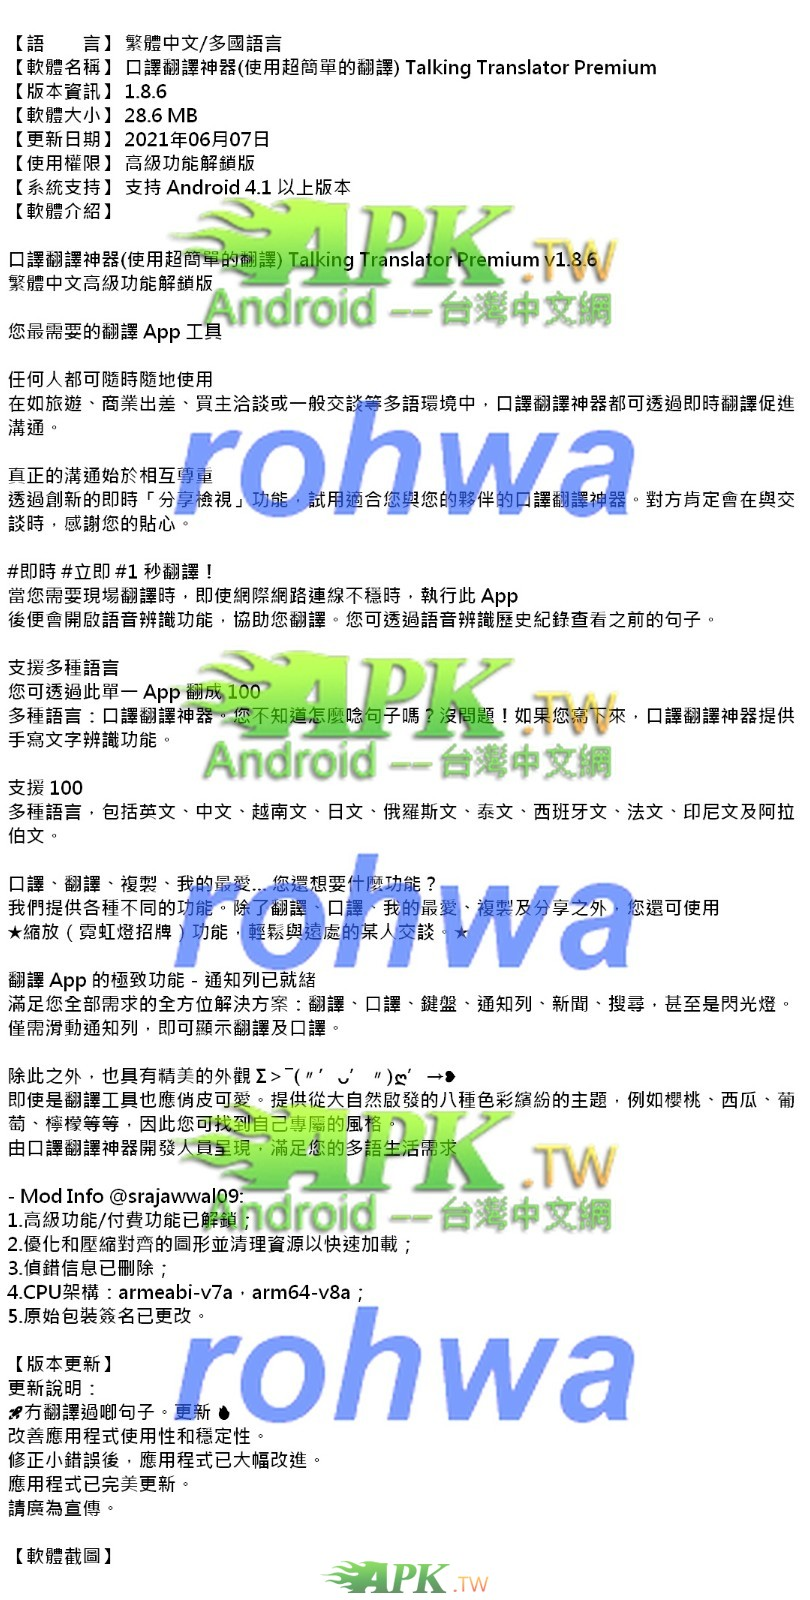 TalkingTranslator_Premium_1.8.6_.jpg